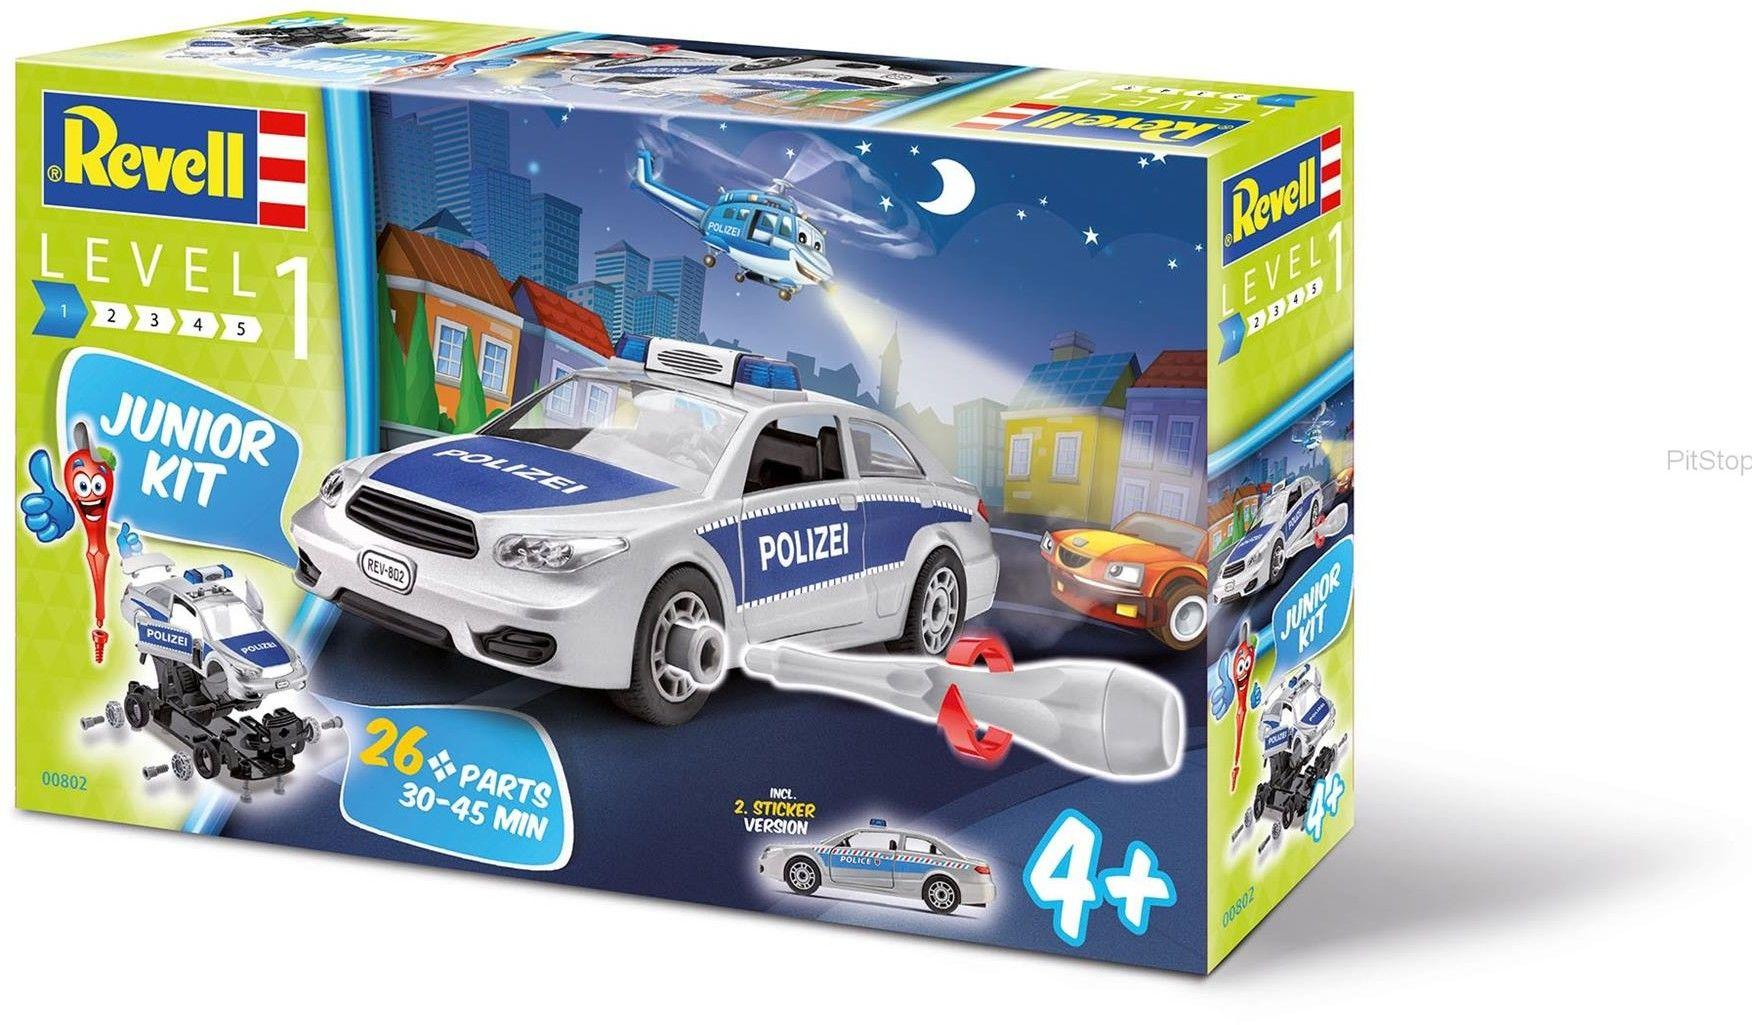 Revell - Junior Kit - Samochód policyjny